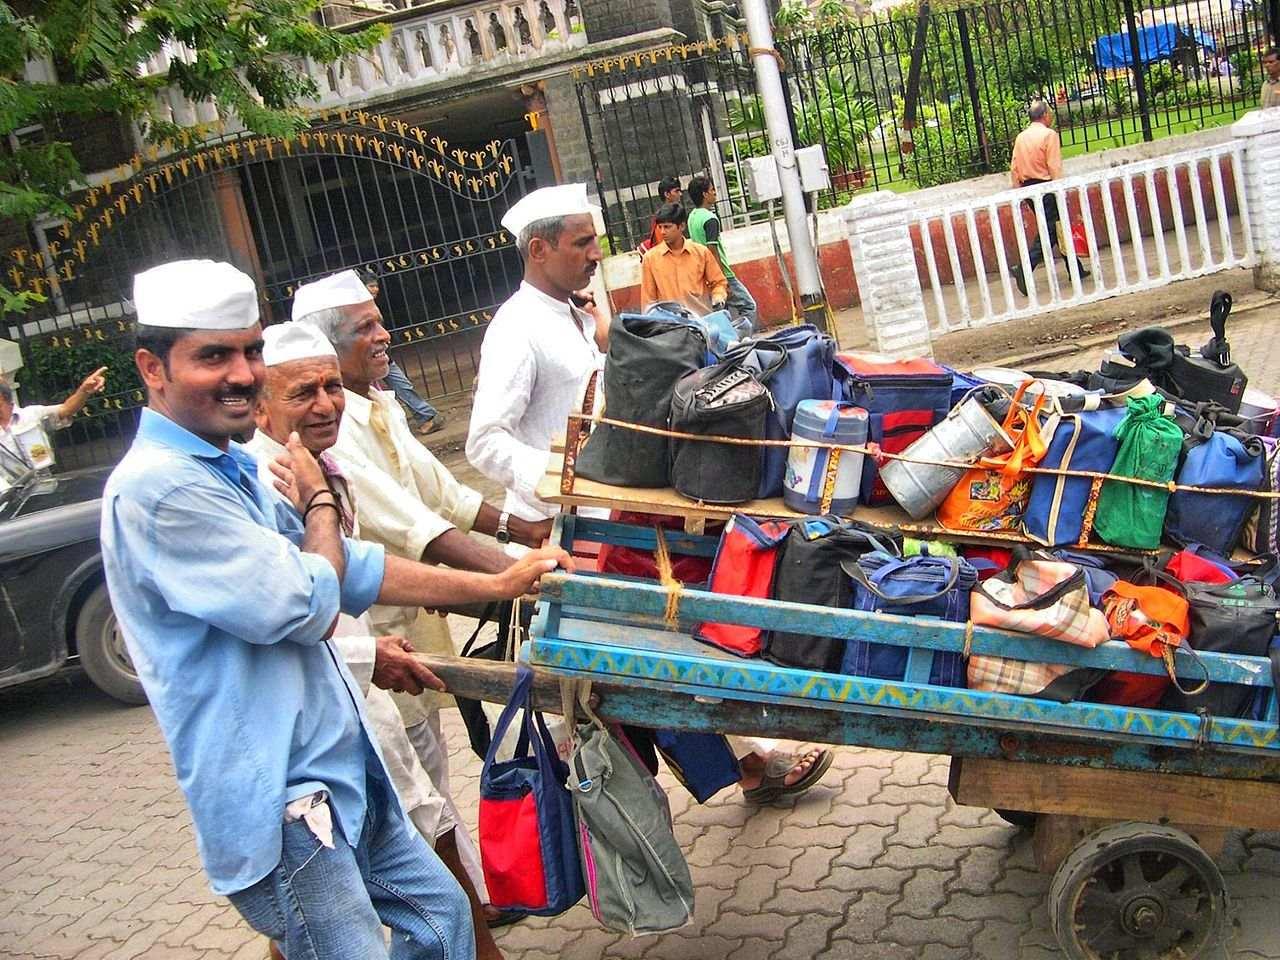 Dabbawalas, Mumbai  The Magical Mumbai (Bombay) – what is there to see Mumbai Dabbawala